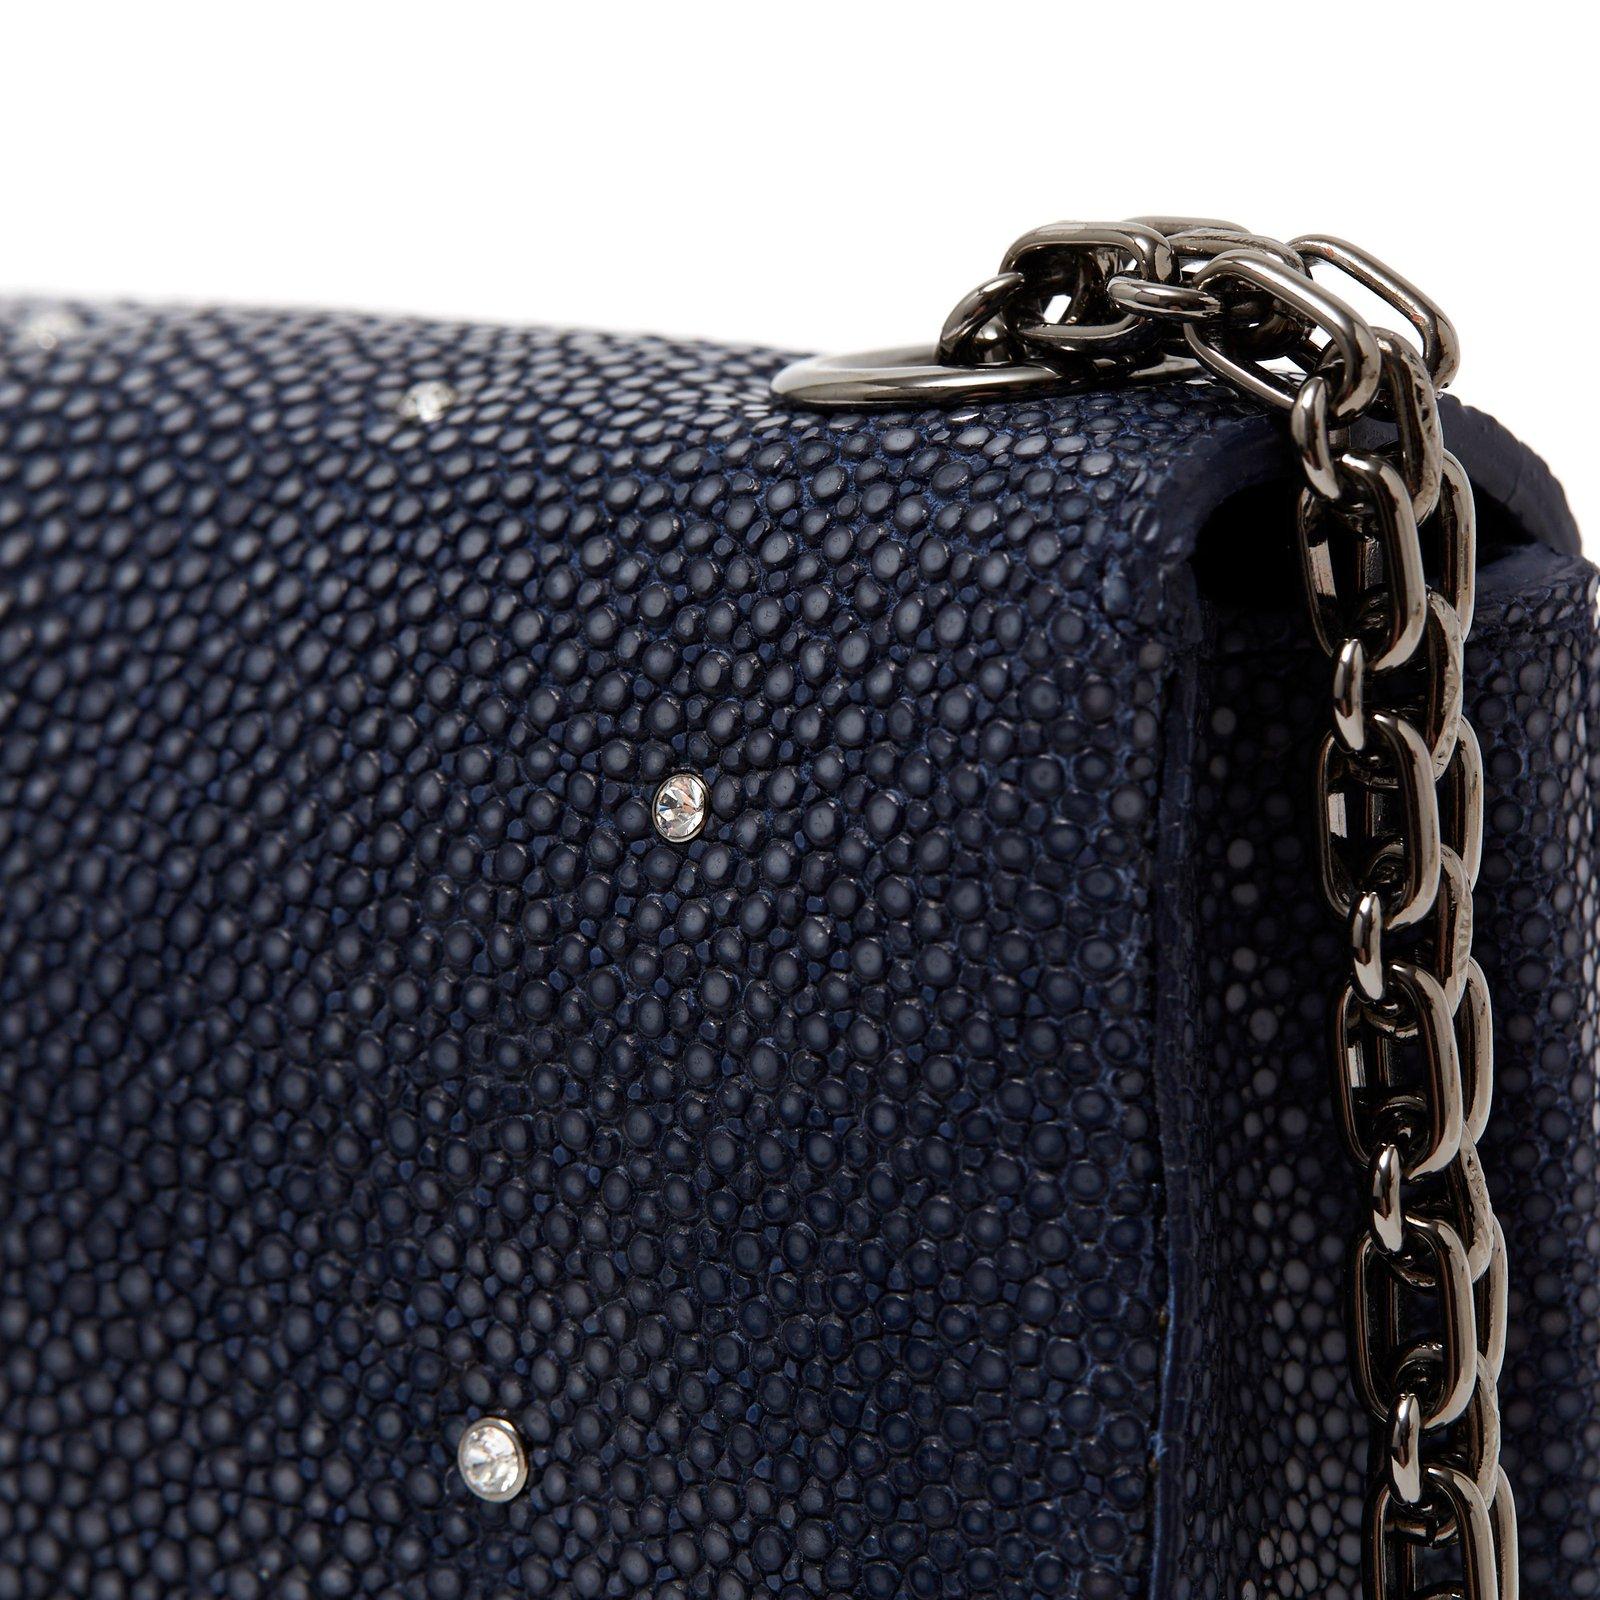 e76216389daaa5 Chanel 2 55 Mini Precious Reen Handbags Other Dark Grey Ref